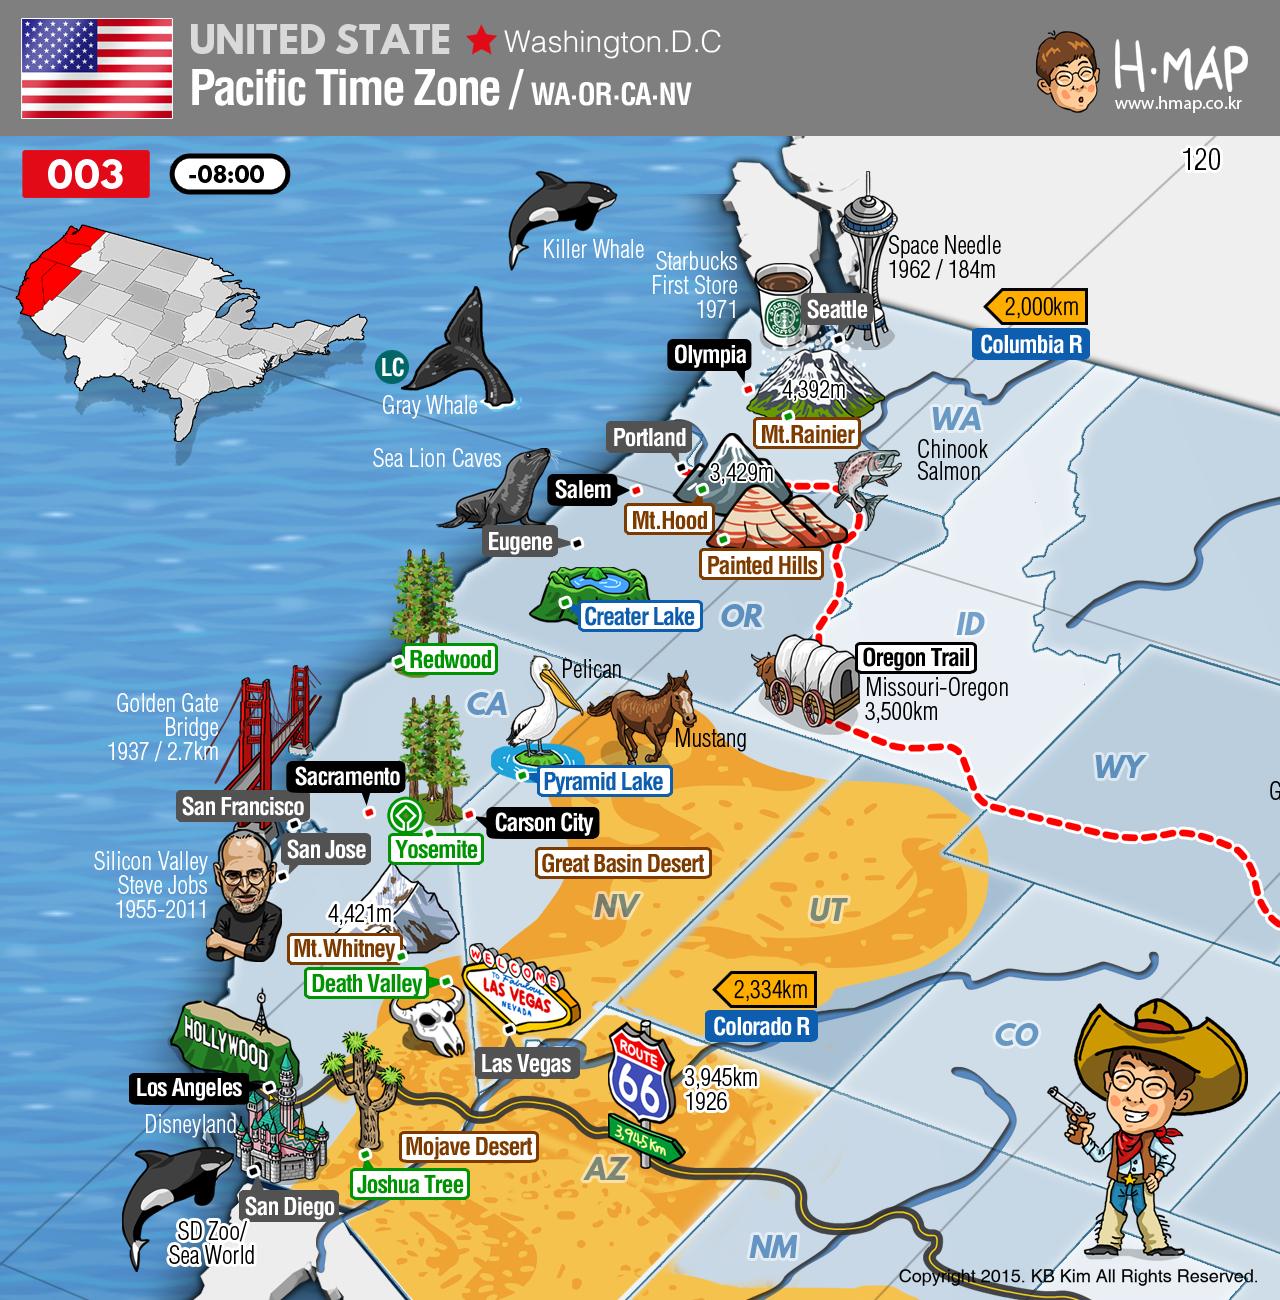 Pacific Time Zone Map Washington Oregon California Nevada - World map time zones now